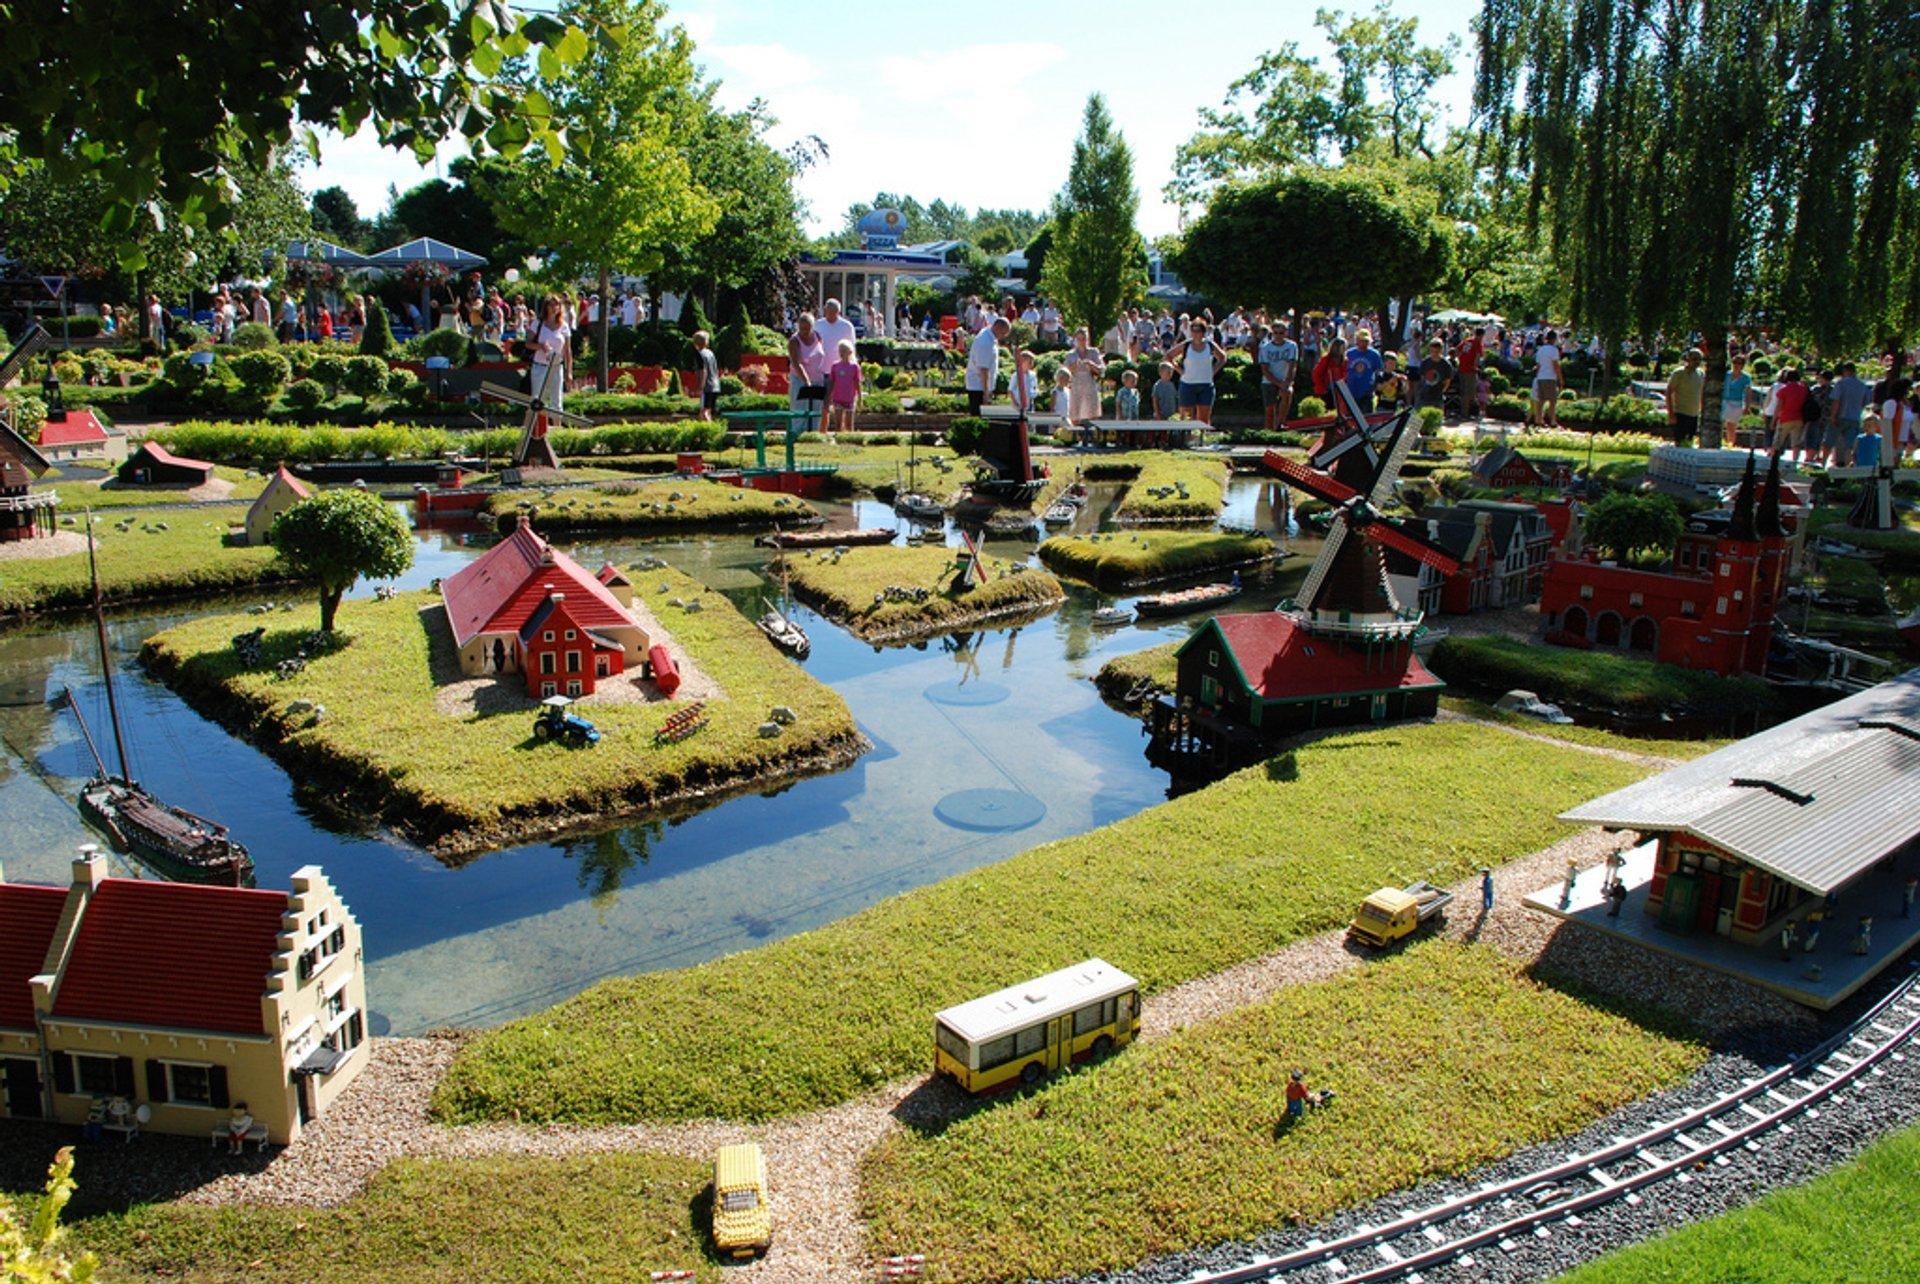 Legoland in Denmark - Best Season 2020